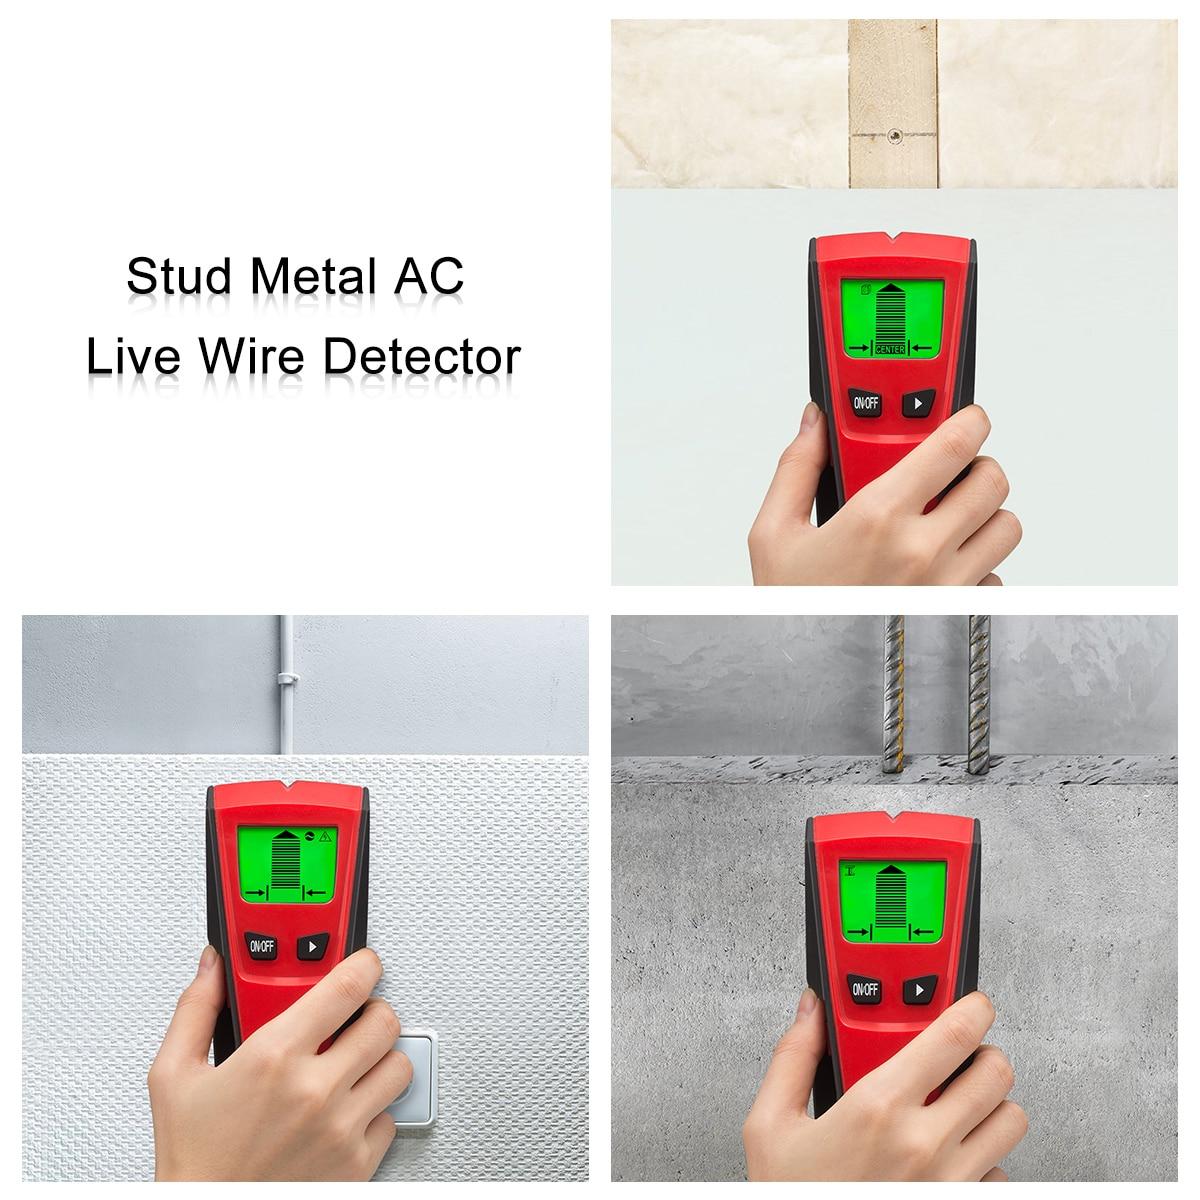 Welquic 3 In 1 Metalldetektoren Finden Metall Holz Studs AC ...